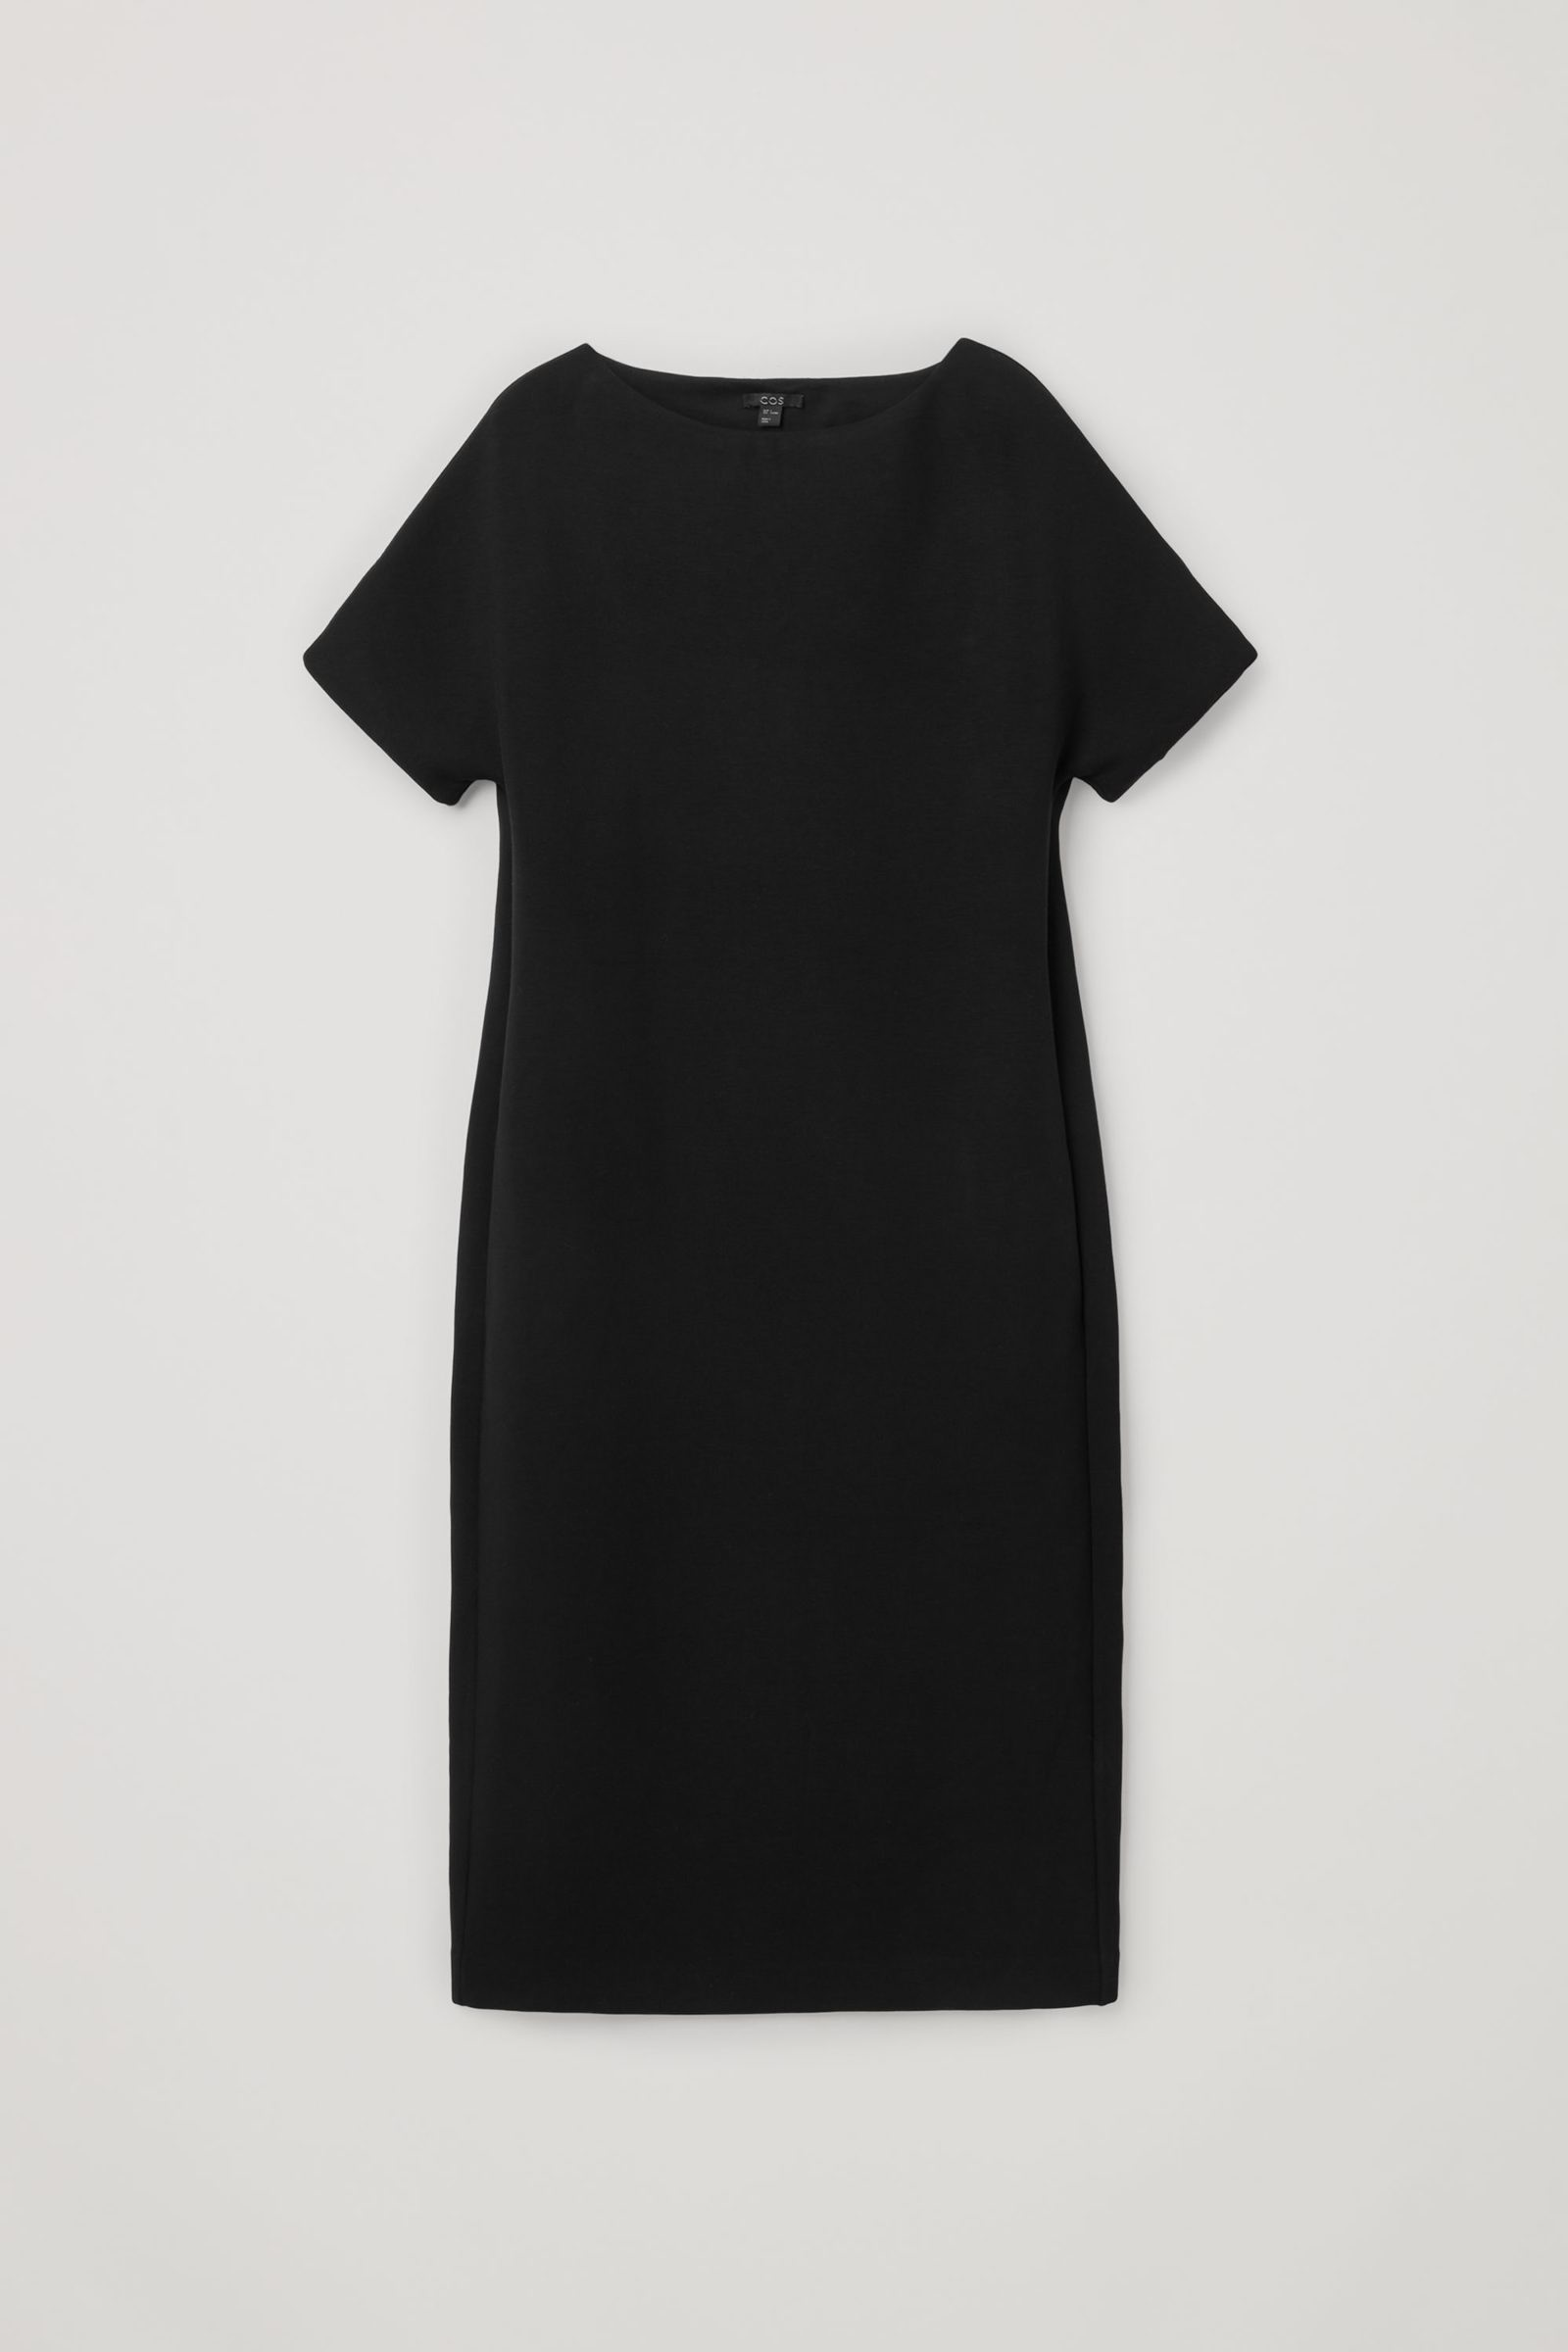 COS 박시 보트 넥 스쿠버 드레스의 블랙컬러 Product입니다.